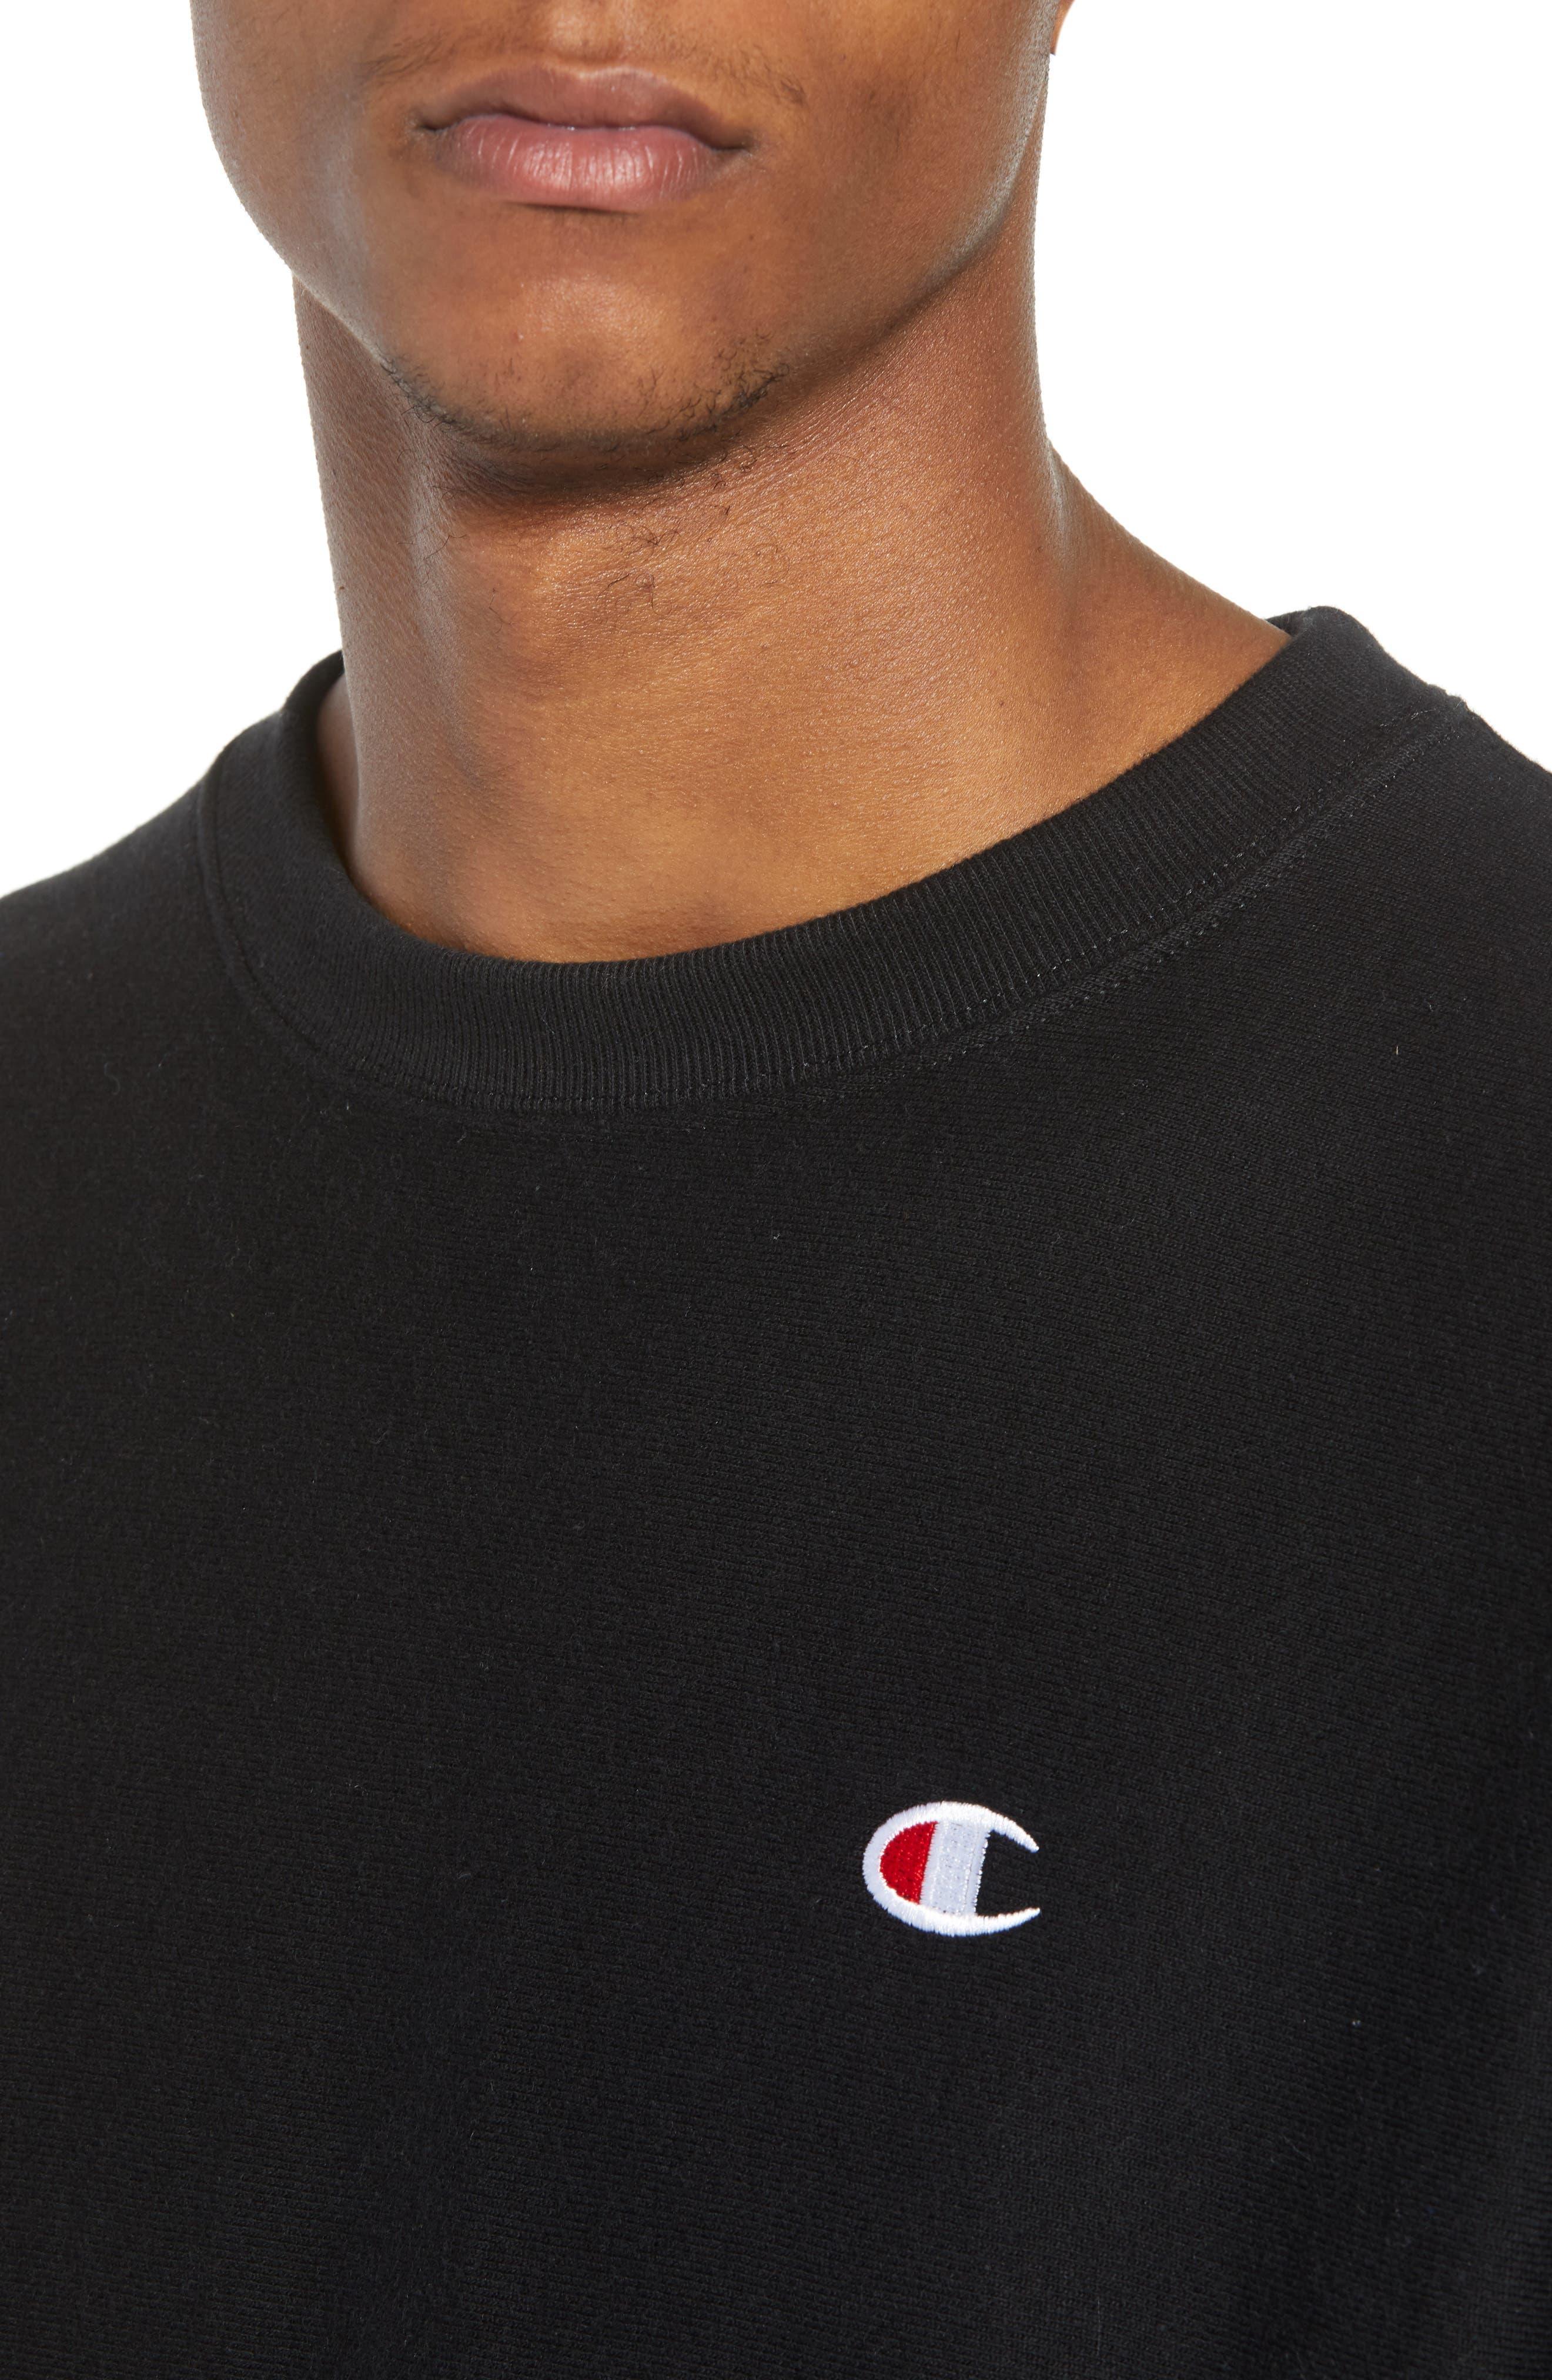 Reverse Weave Sweatshirt,                             Alternate thumbnail 4, color,                             Black